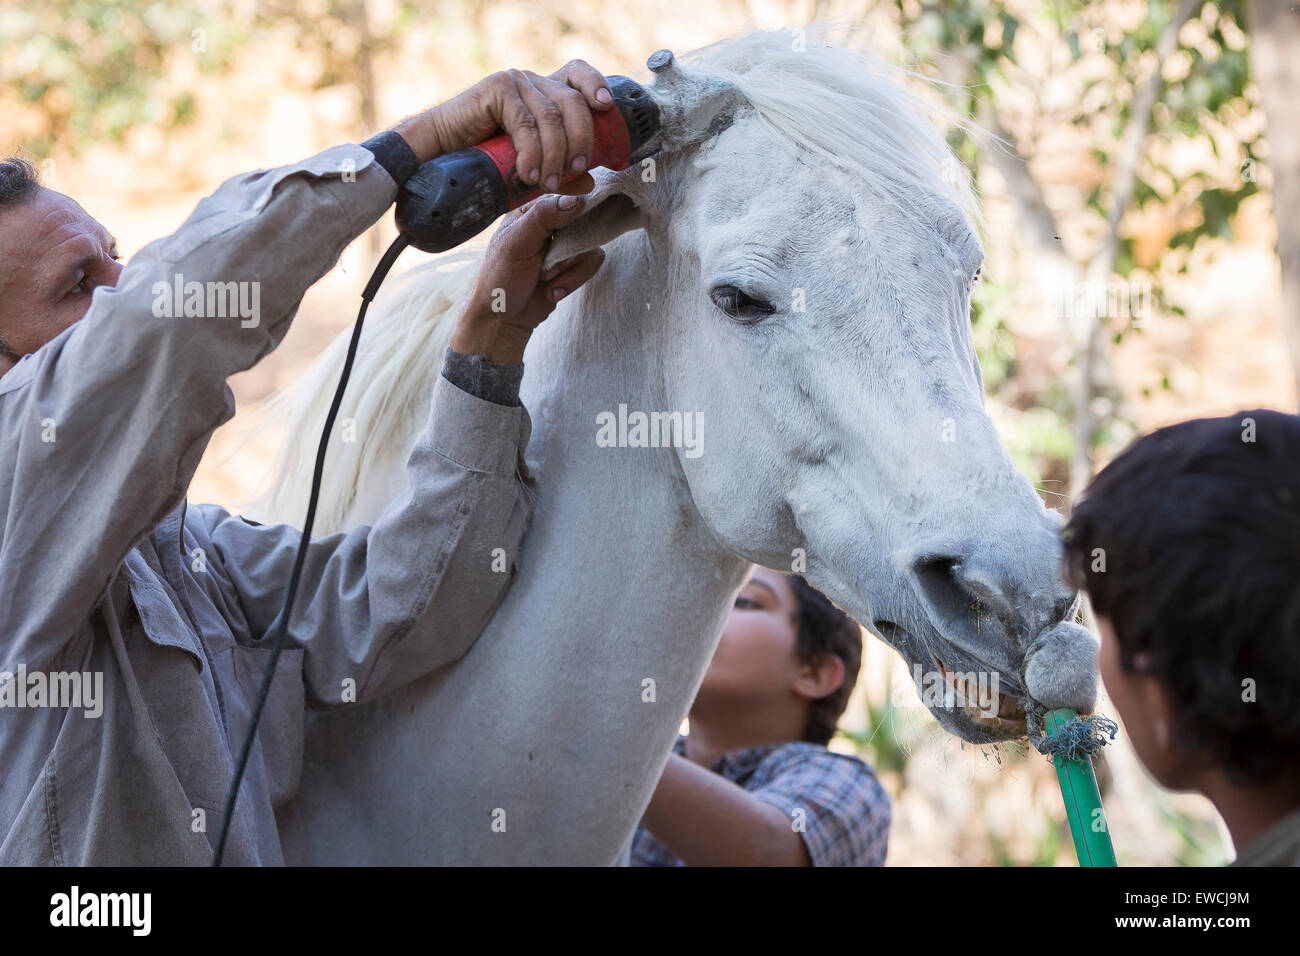 Arab Horse, Arabian Horse. Groom clipping a a gray horse. Egypt - Stock Image